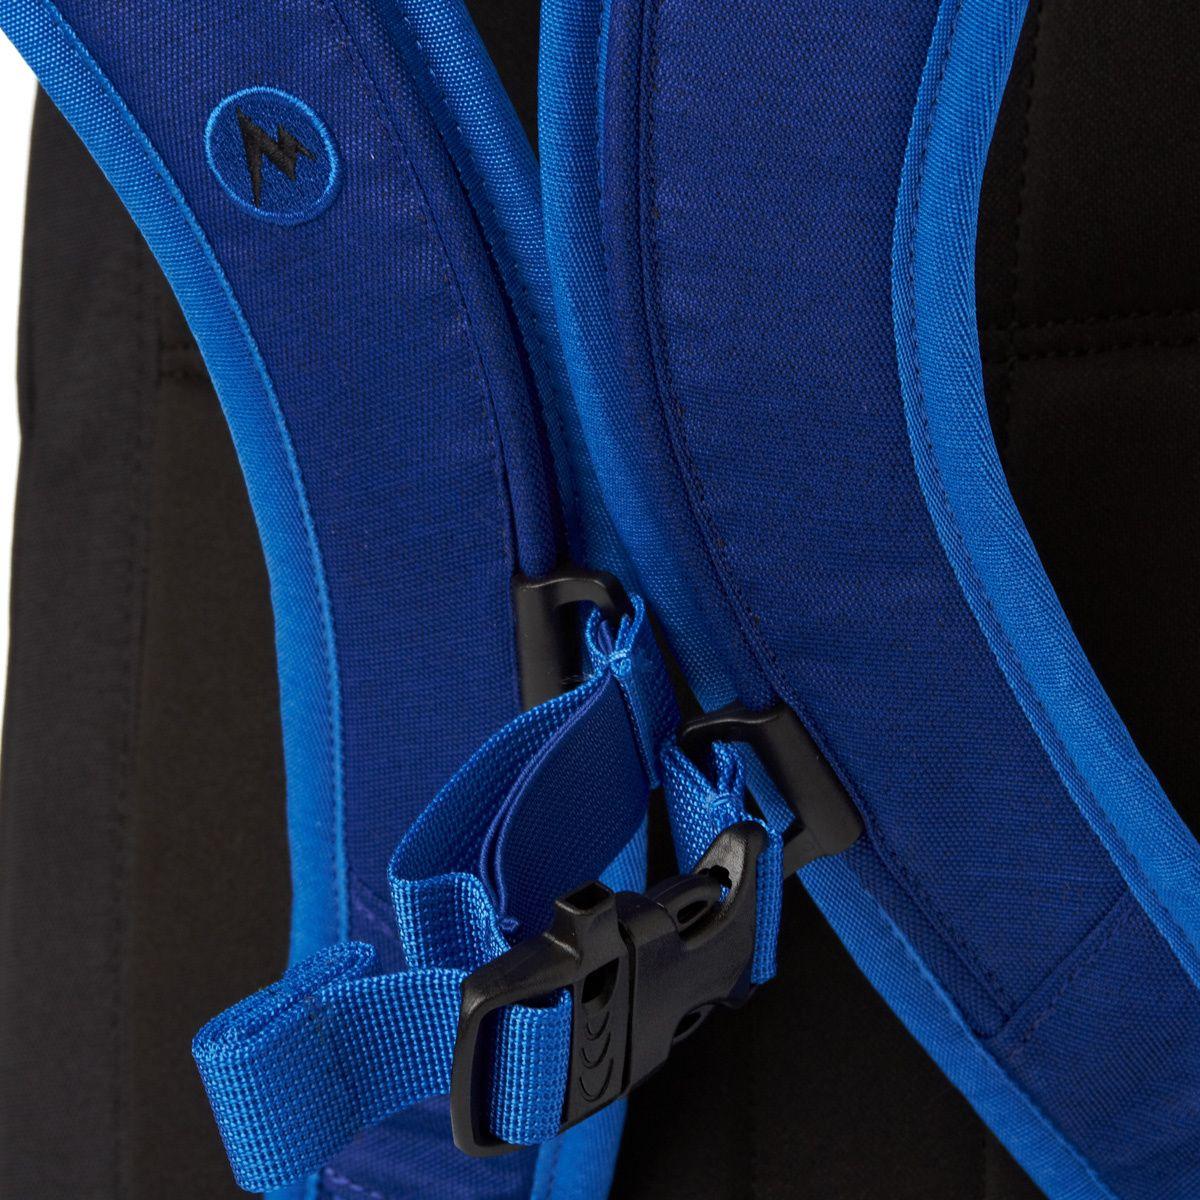 Рюкзак Marmot Curbside Dark Azure-Black 26850-2088-ONE